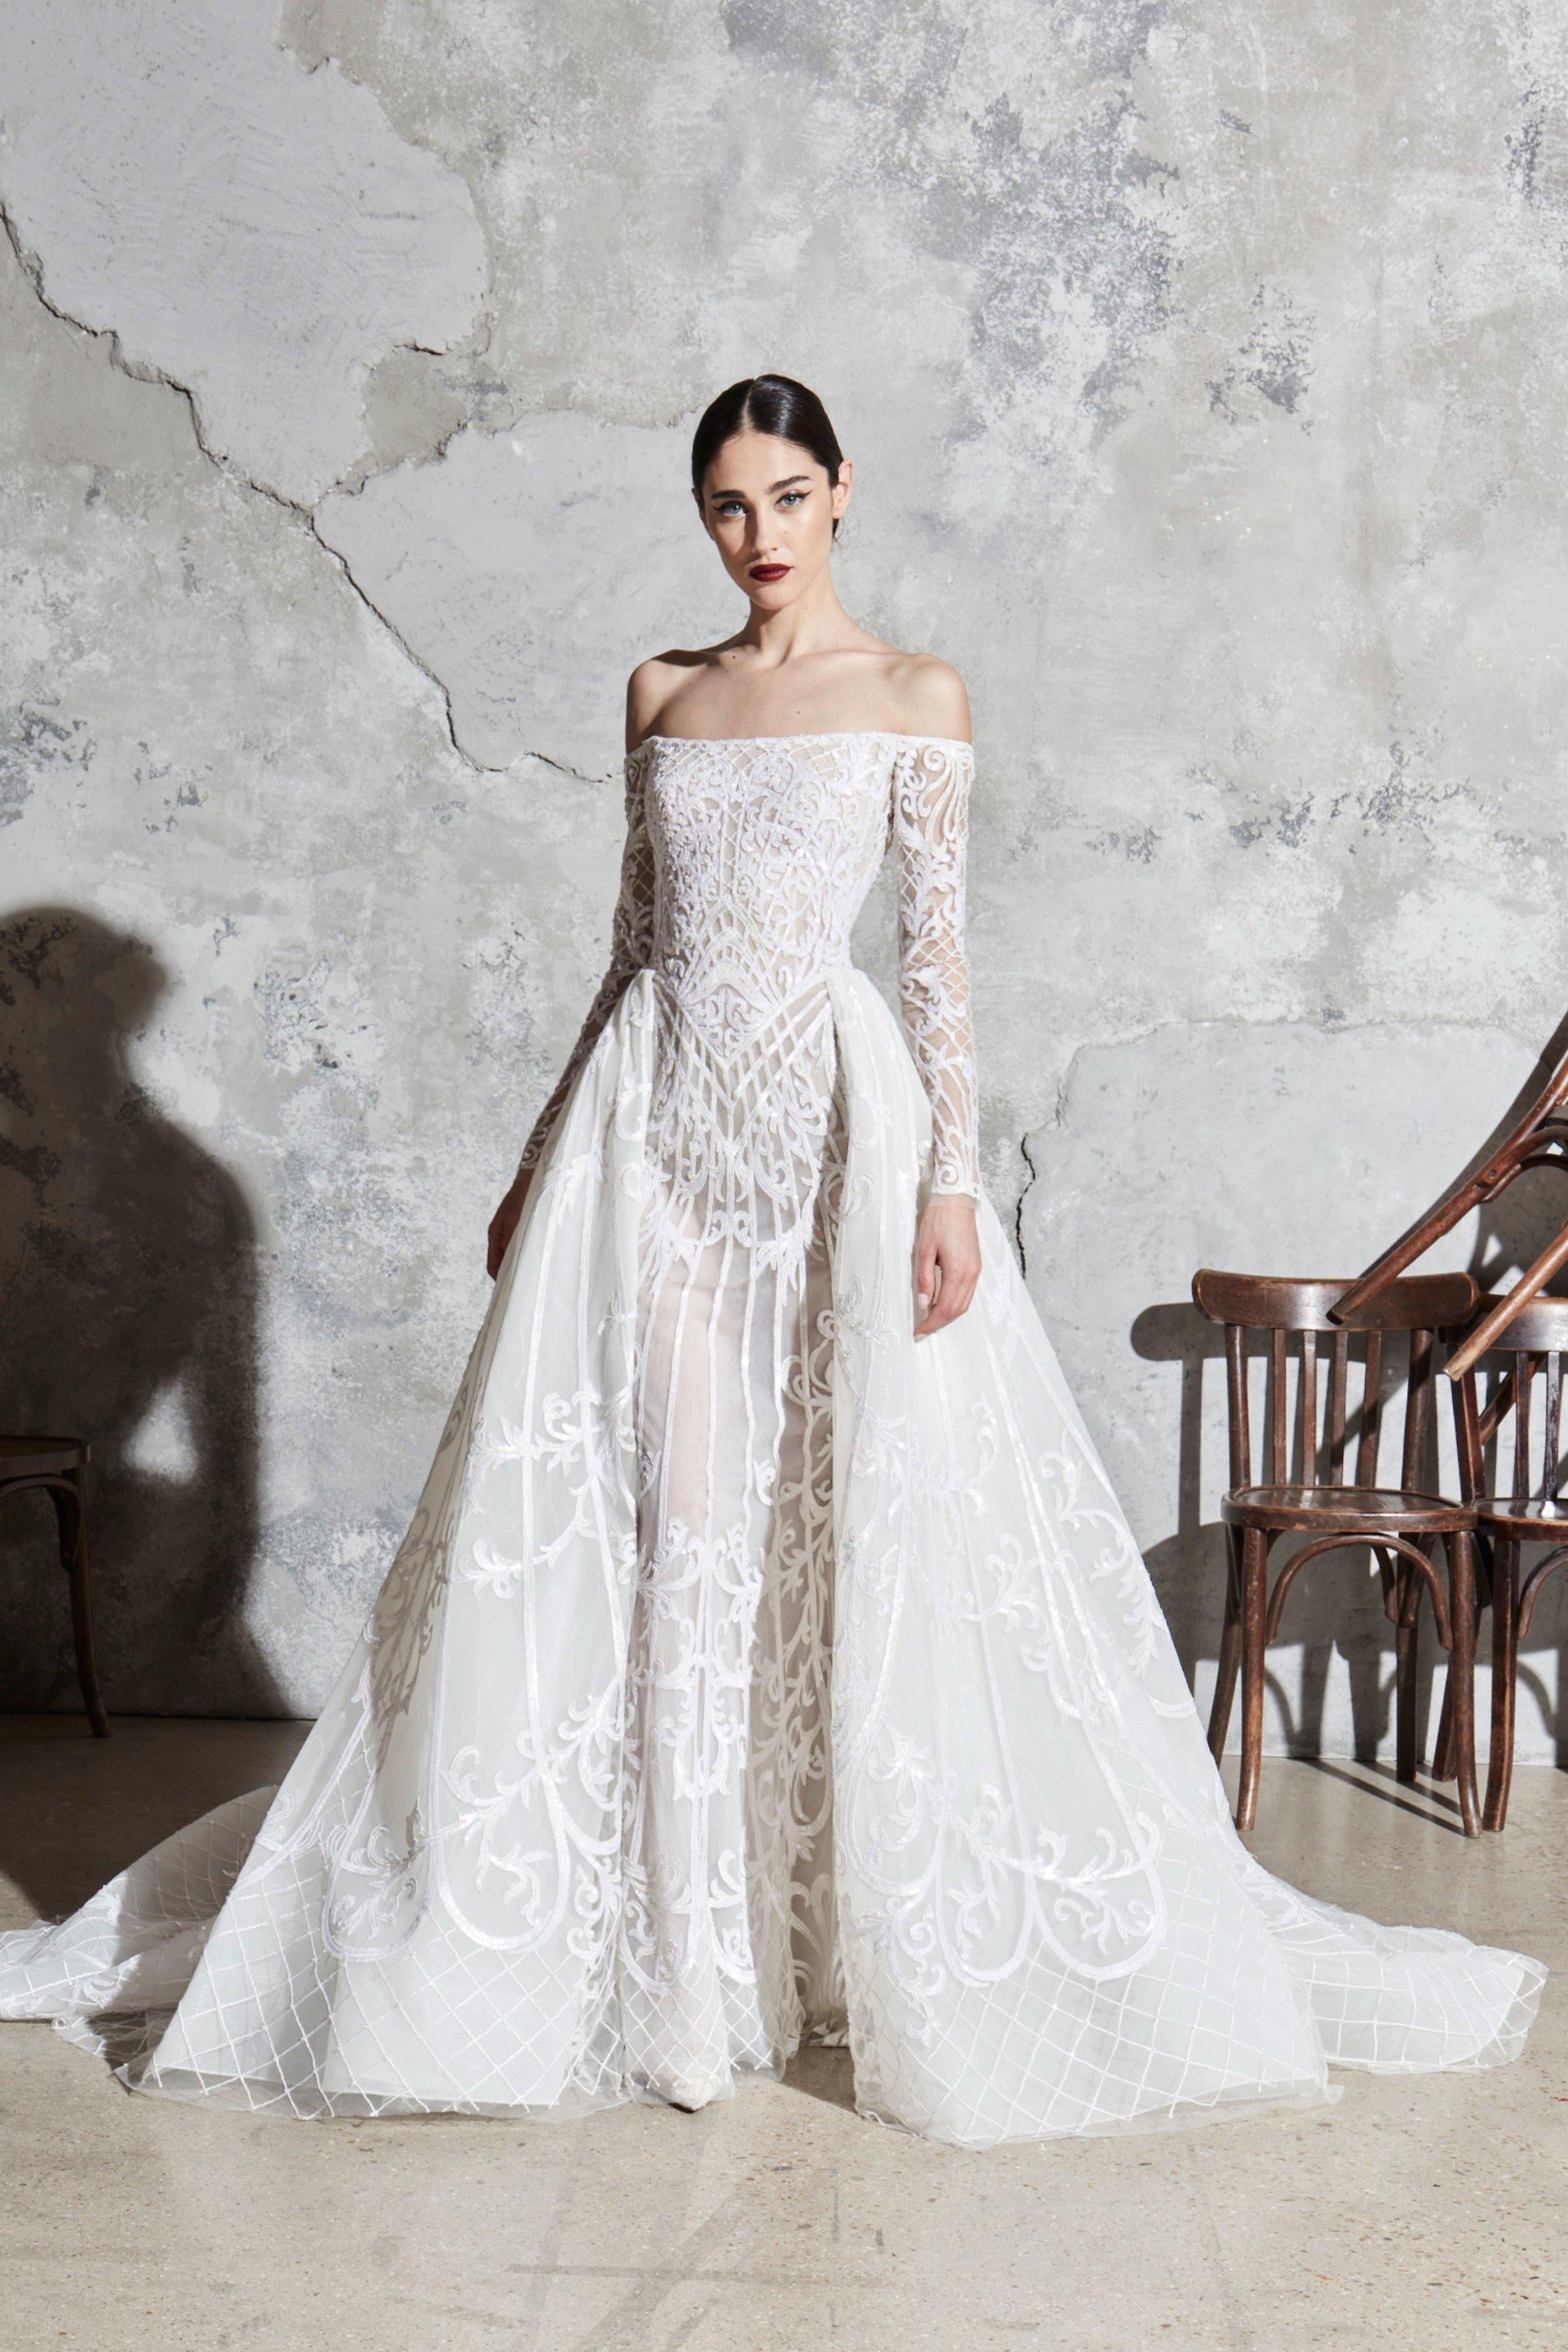 00016-zuhair-murad-new-york-bridal-Spring-2020-CREDIT-Thomas-Nutzl.jpg